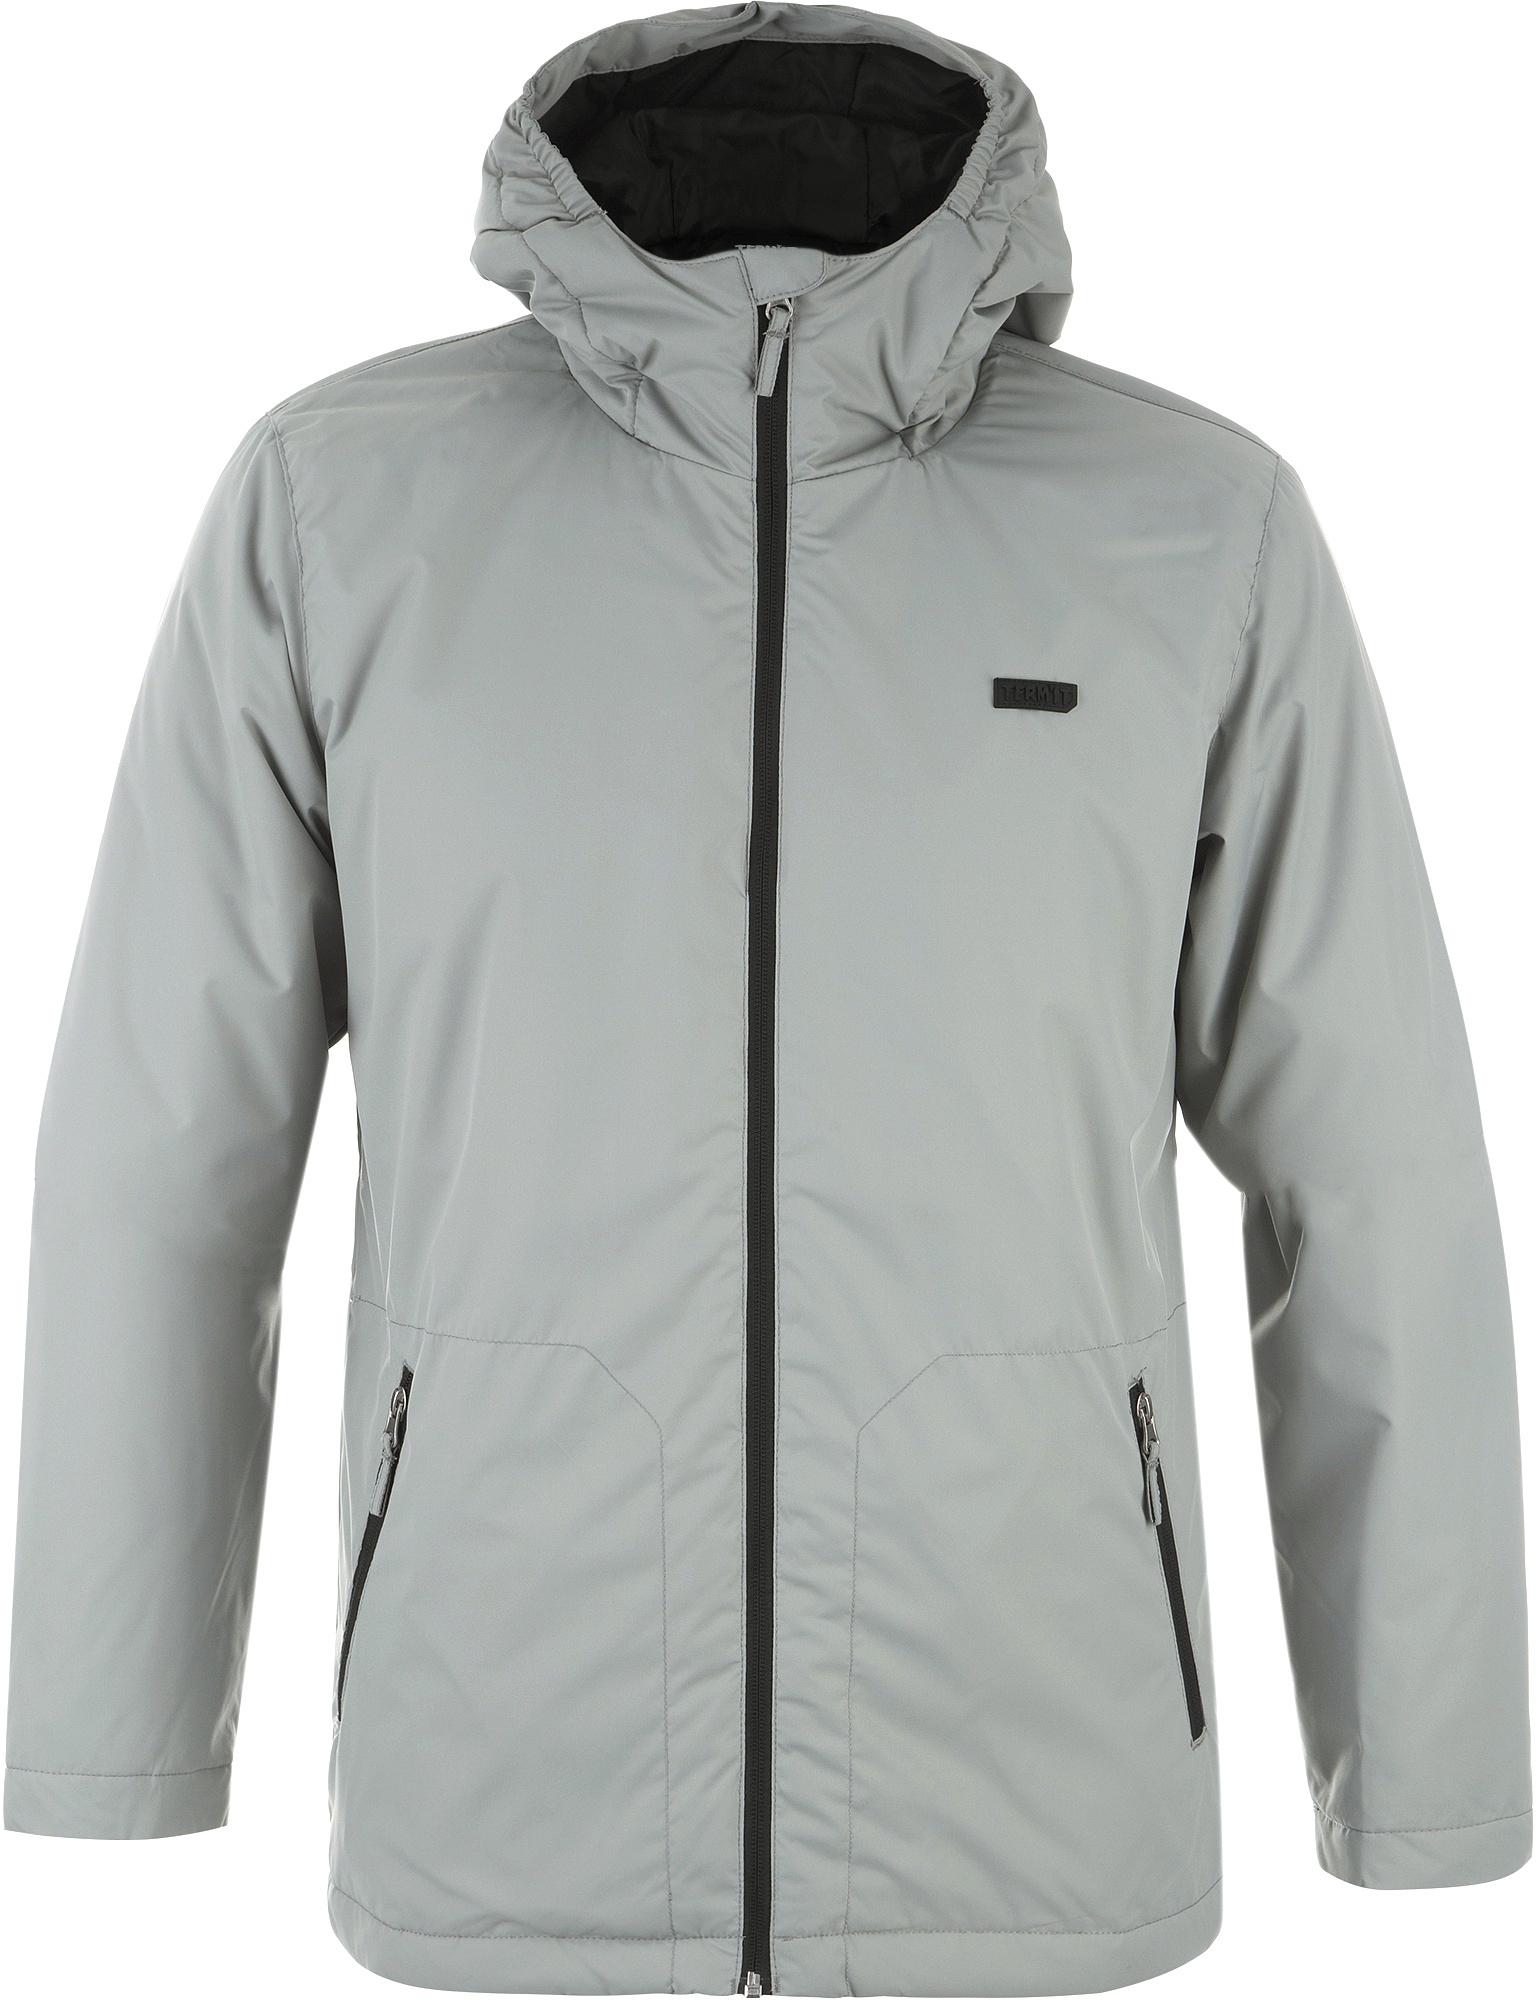 Termit Куртка утепленная мужская Termit, размер 54 куртка мужская geox цвет темно синий m8220kt2447f4386 размер 54